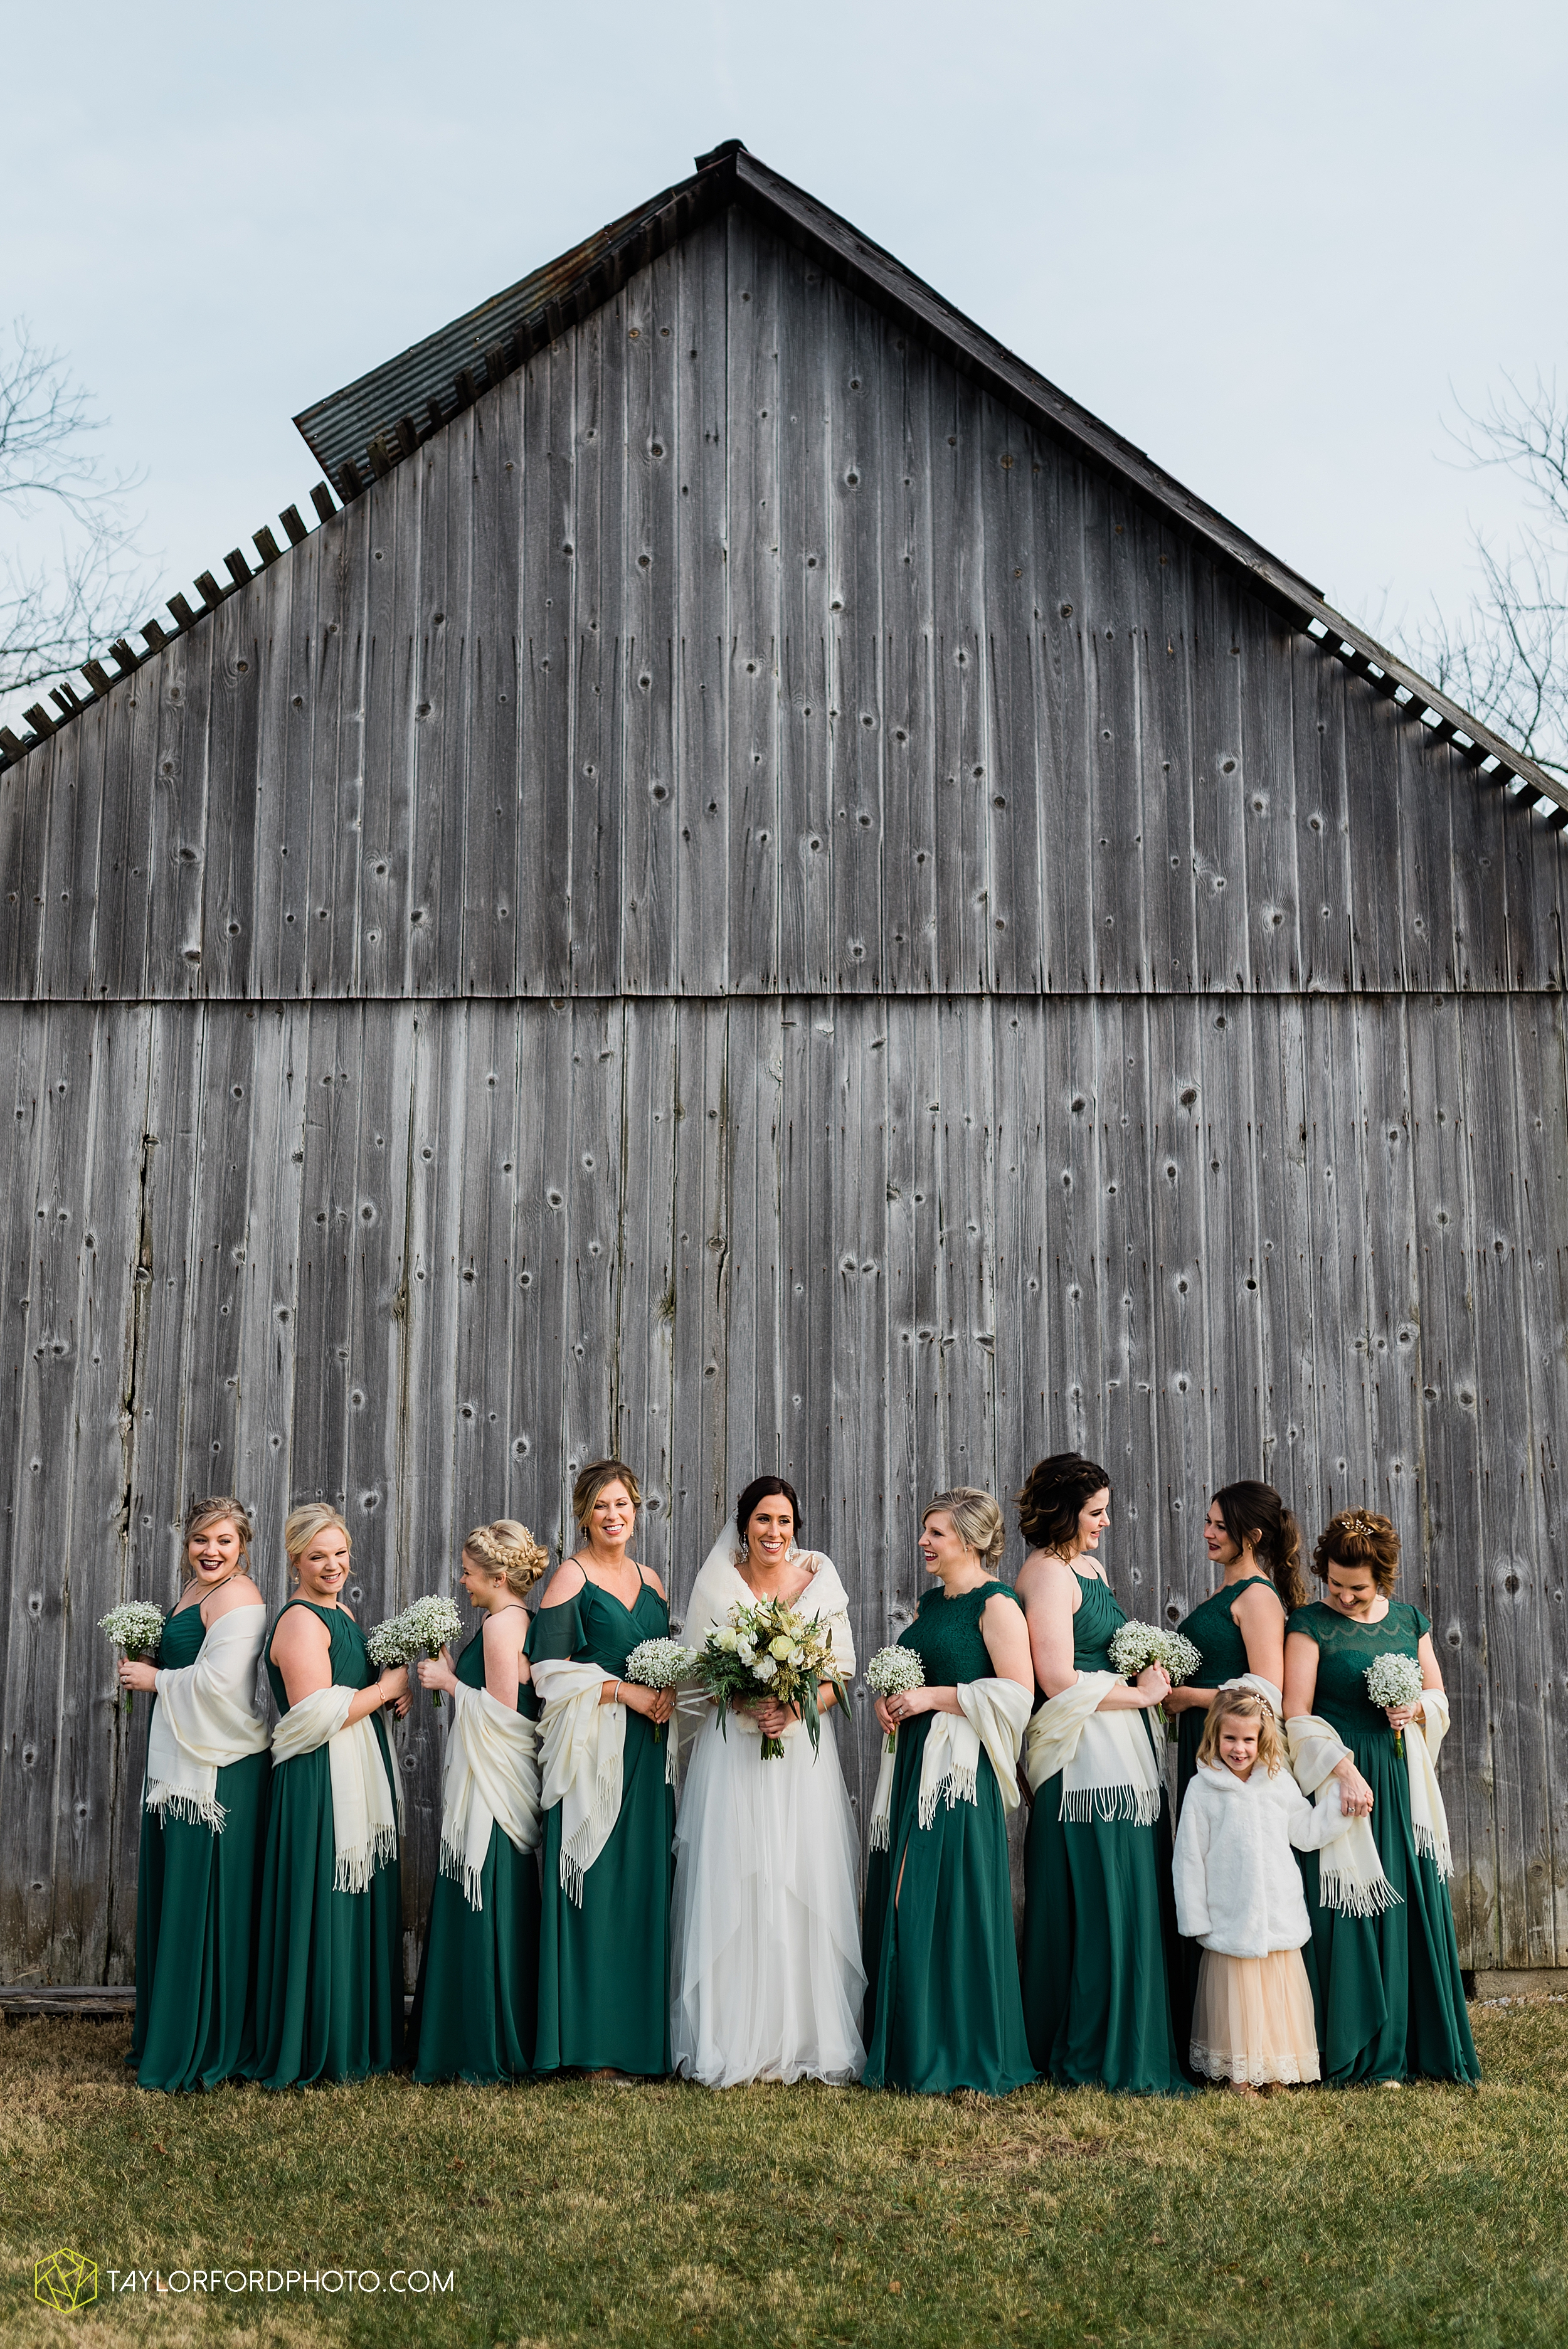 van-wert-ohio-first-united-methodist-downtown-van-wert-county-jr-fair-building-reception-winter-christmas-wedding-photographer-taylor-ford-hirschy-photographer_1882.jpg